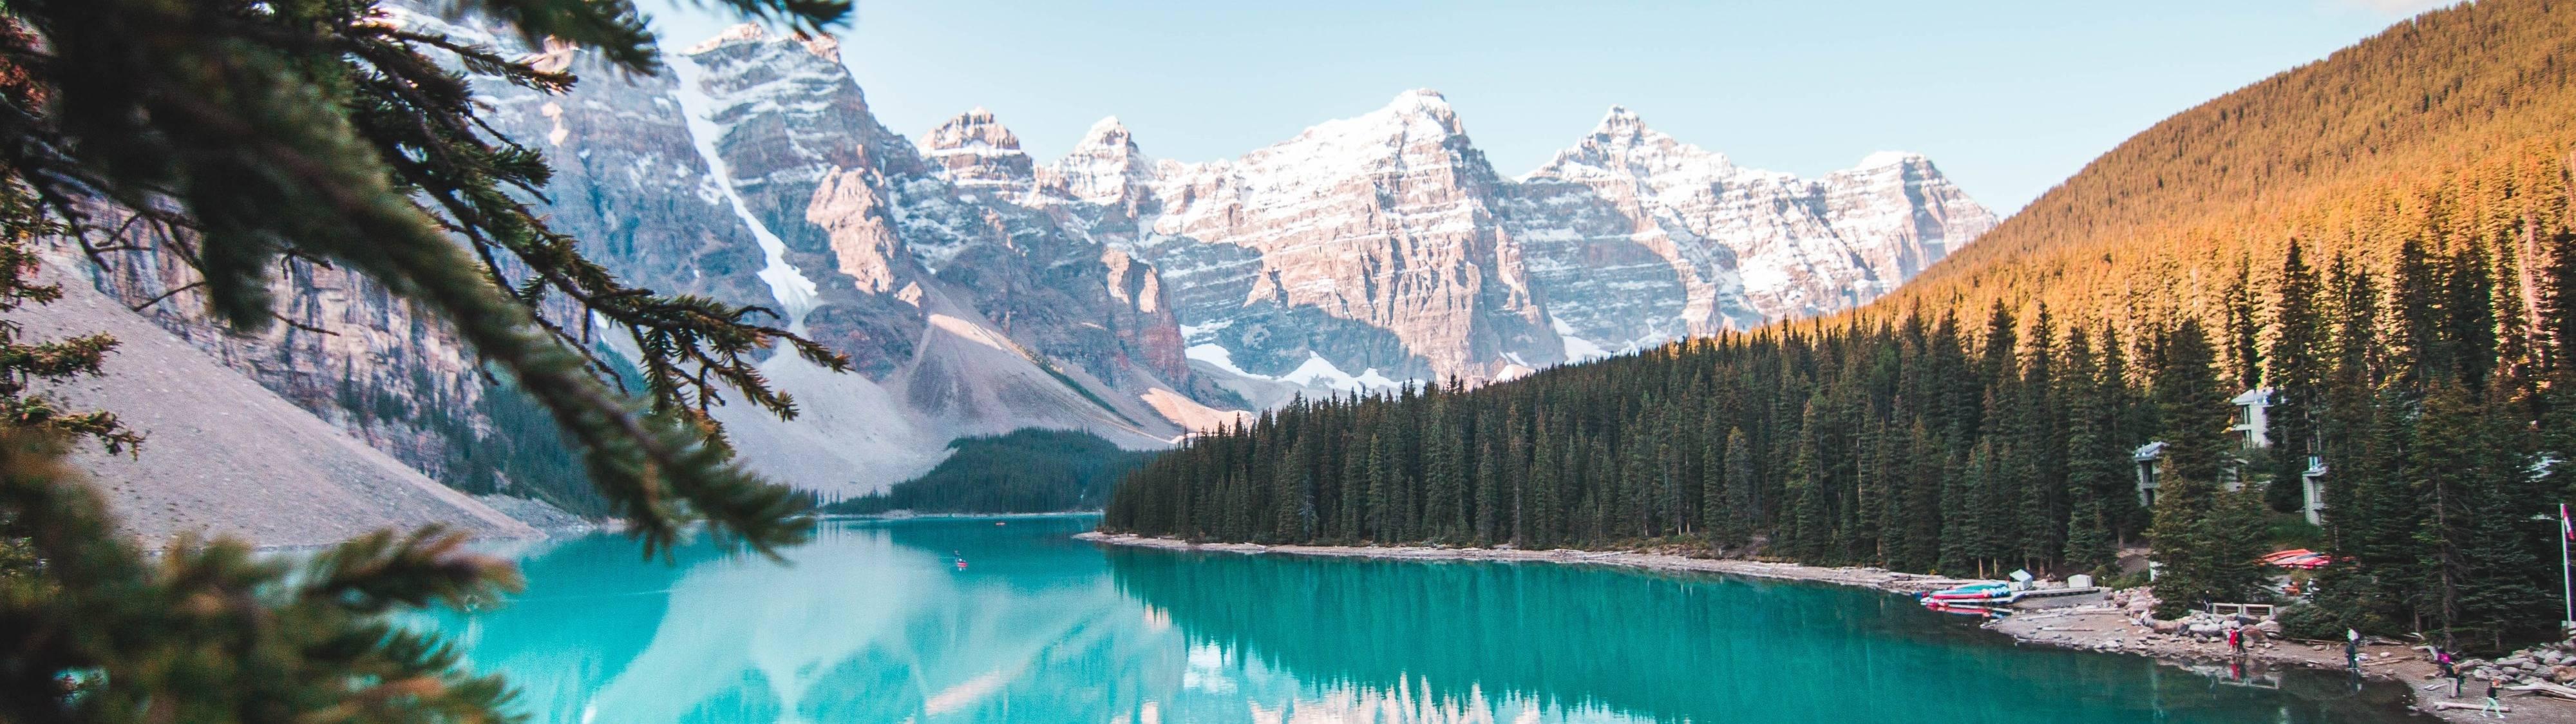 Reiseplaner World and Travel Kanada